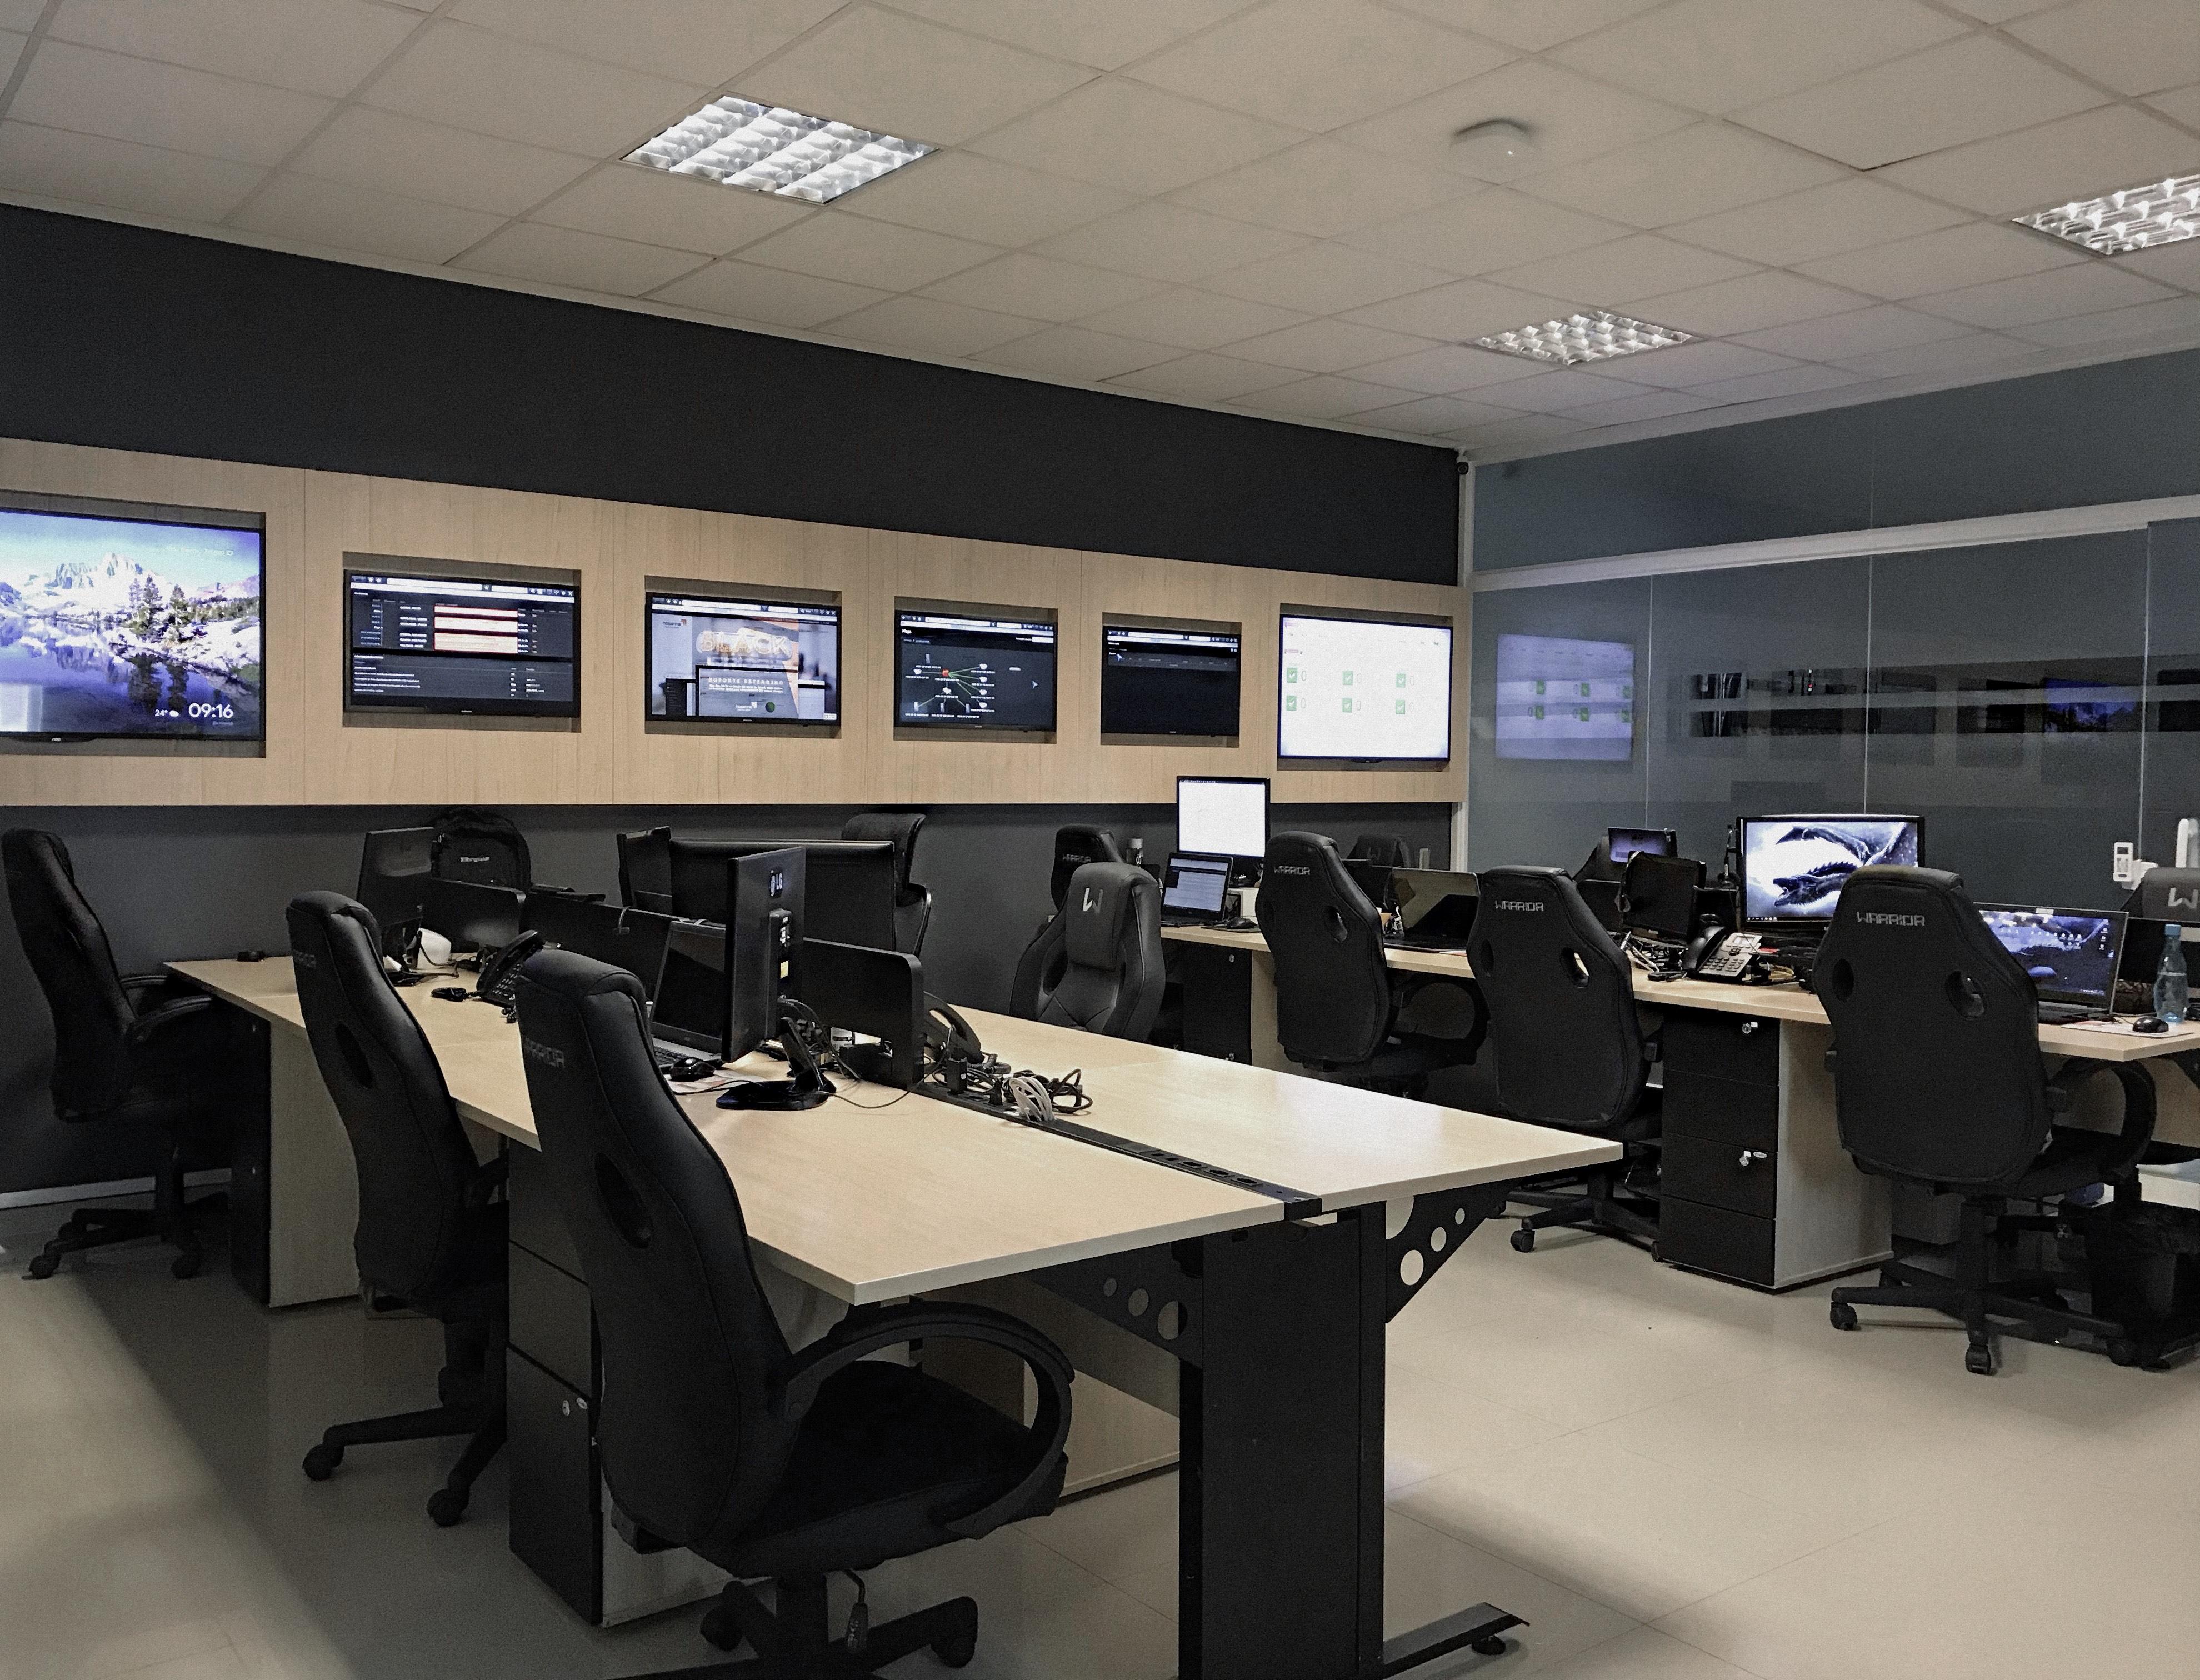 Hosanna Tecnologia - Infraestrutura